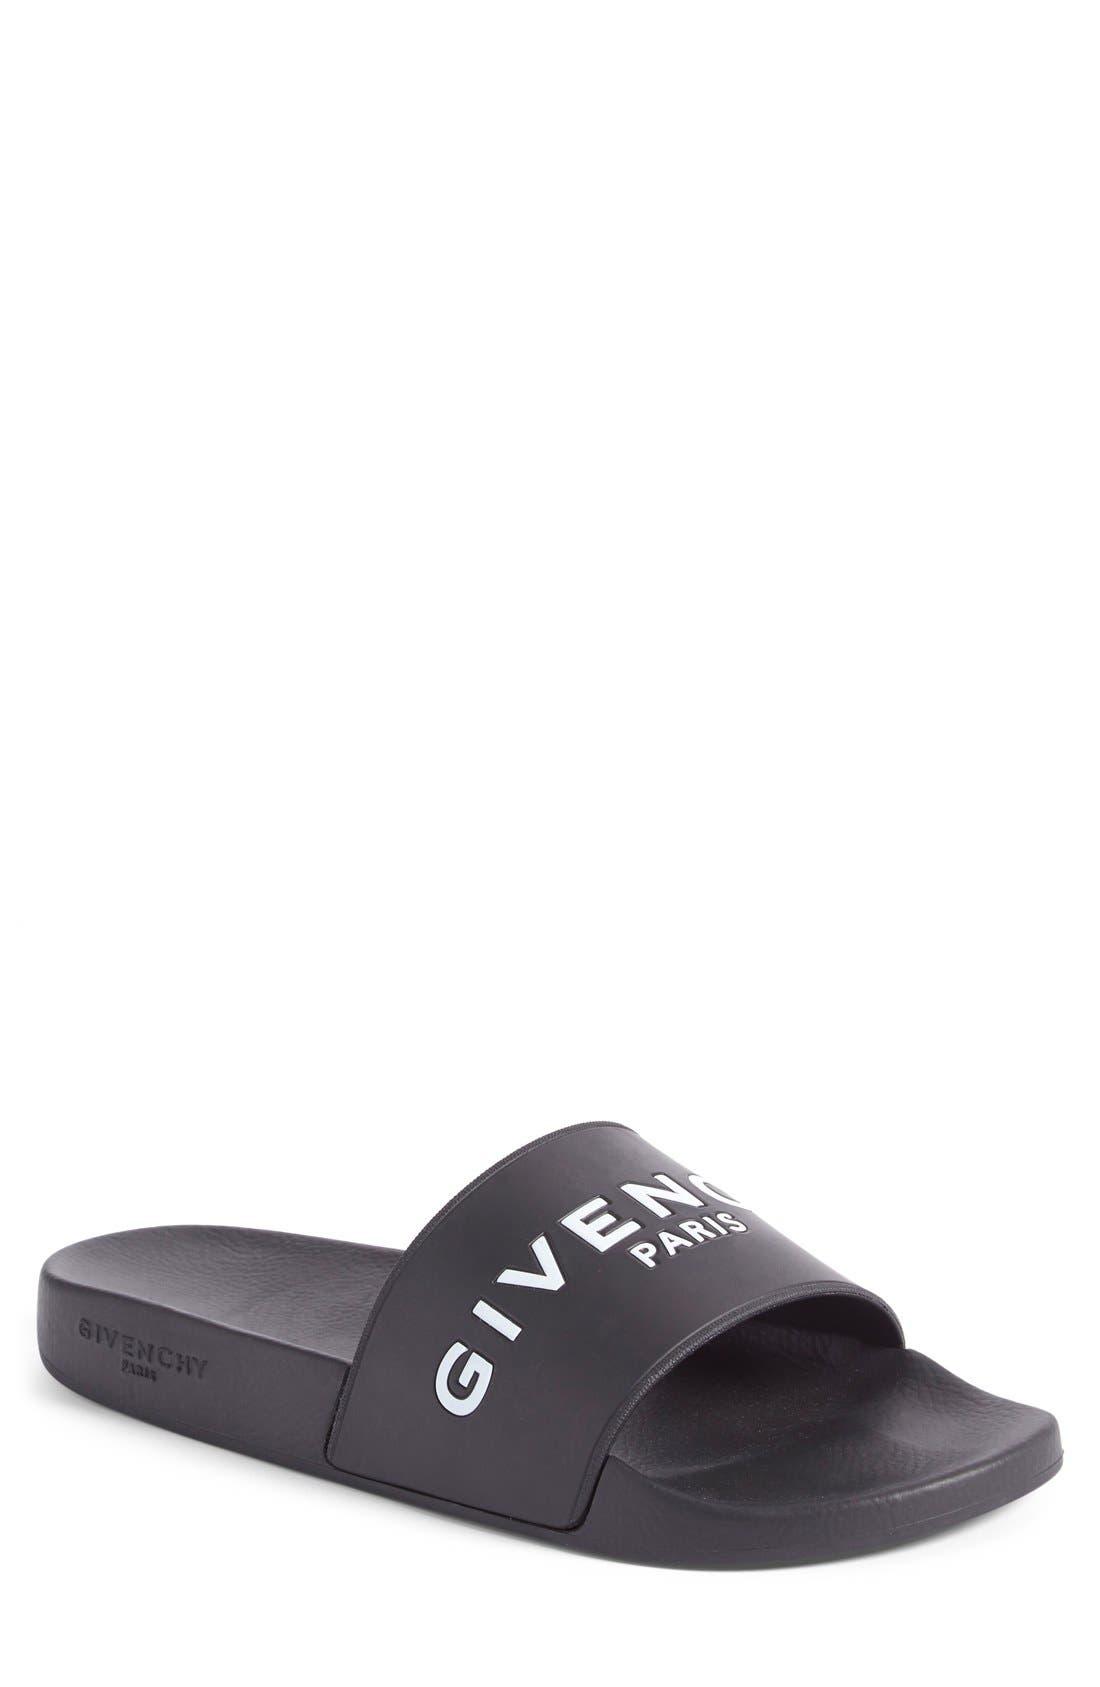 7f3968e1215c Buy grey adidas slides   OFF77% Discounted